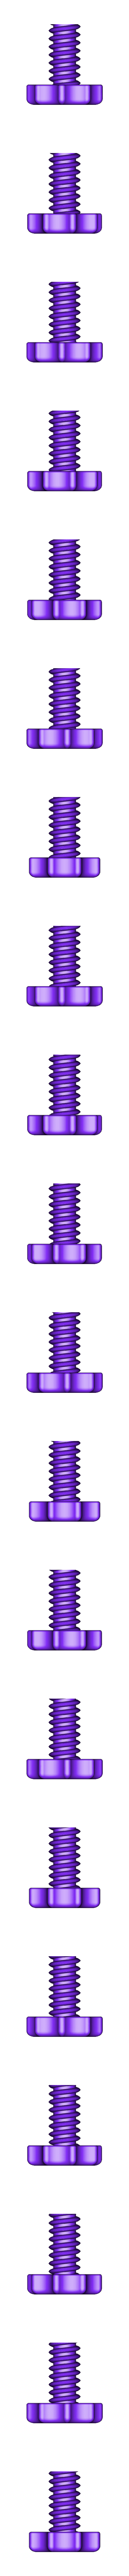 Shower Head Holder Screwball.stl Download free STL file Shower Head Holder • 3D printing template, HomeLite